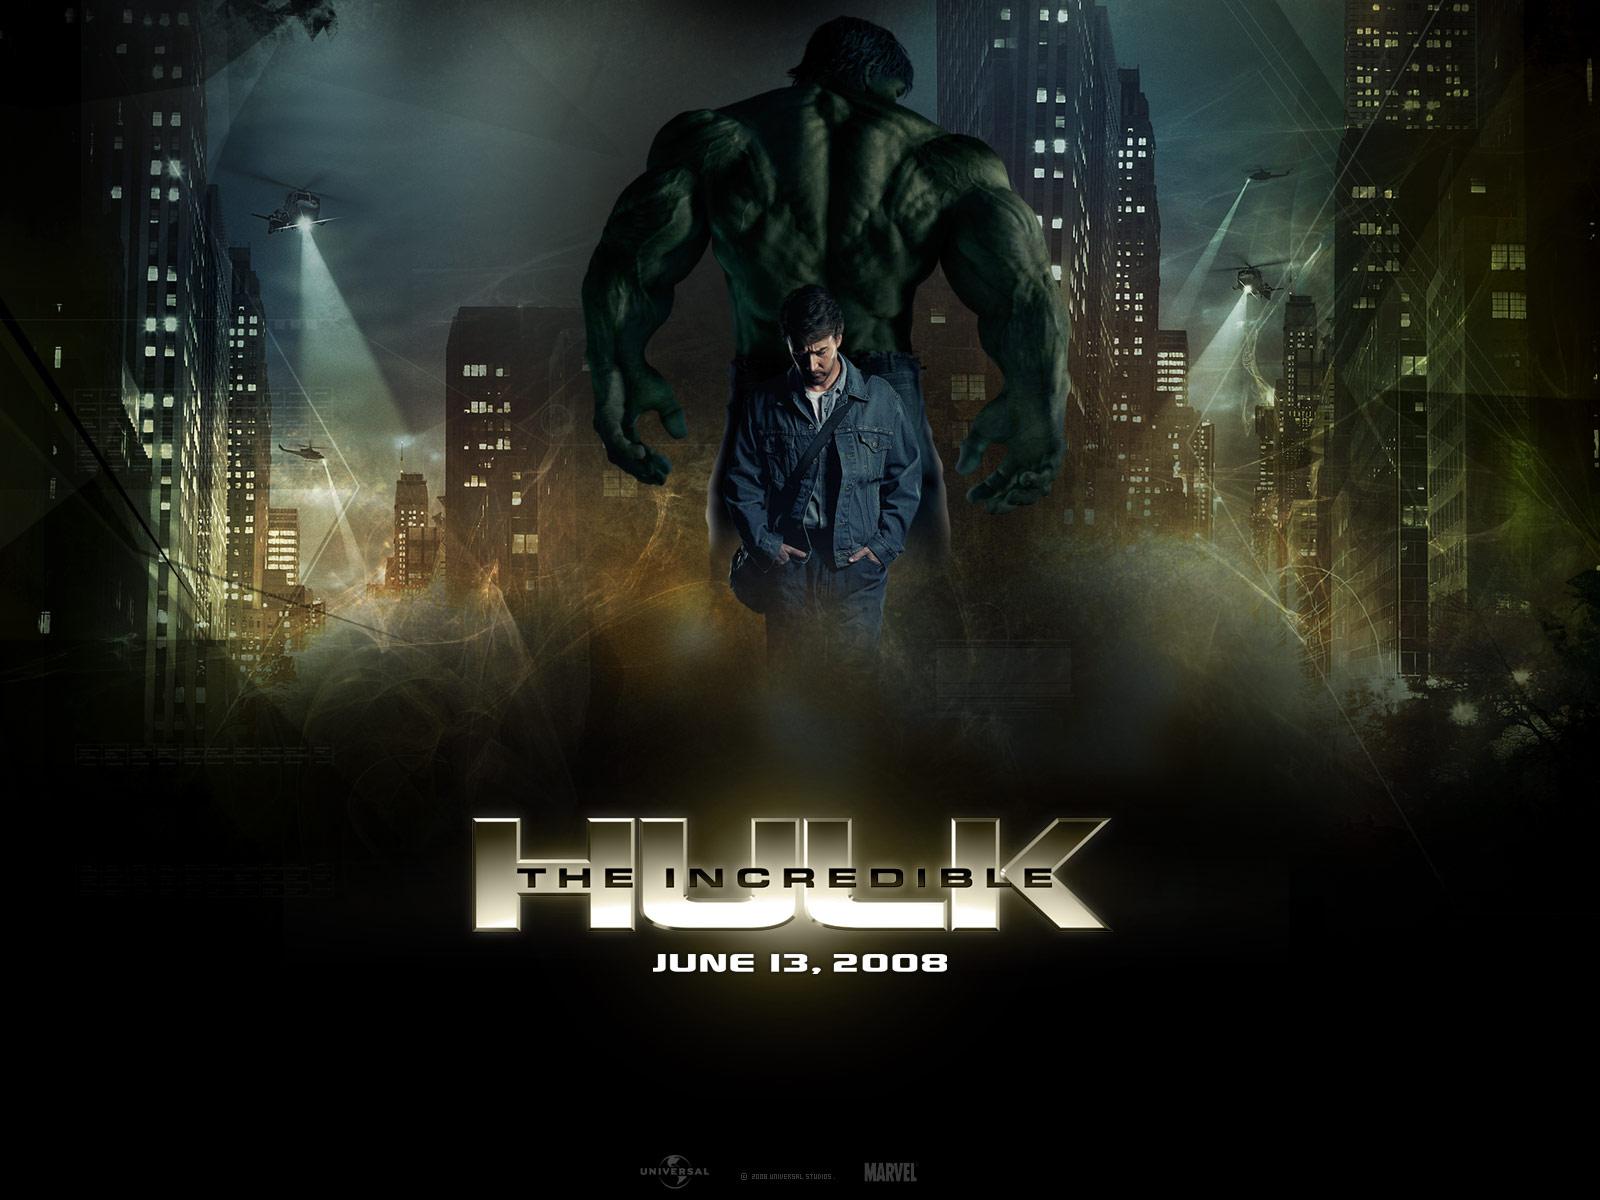 CAVEMEN GO Easter Egg Hunt The Incredible Hulk 2008 Part One 1600x1200